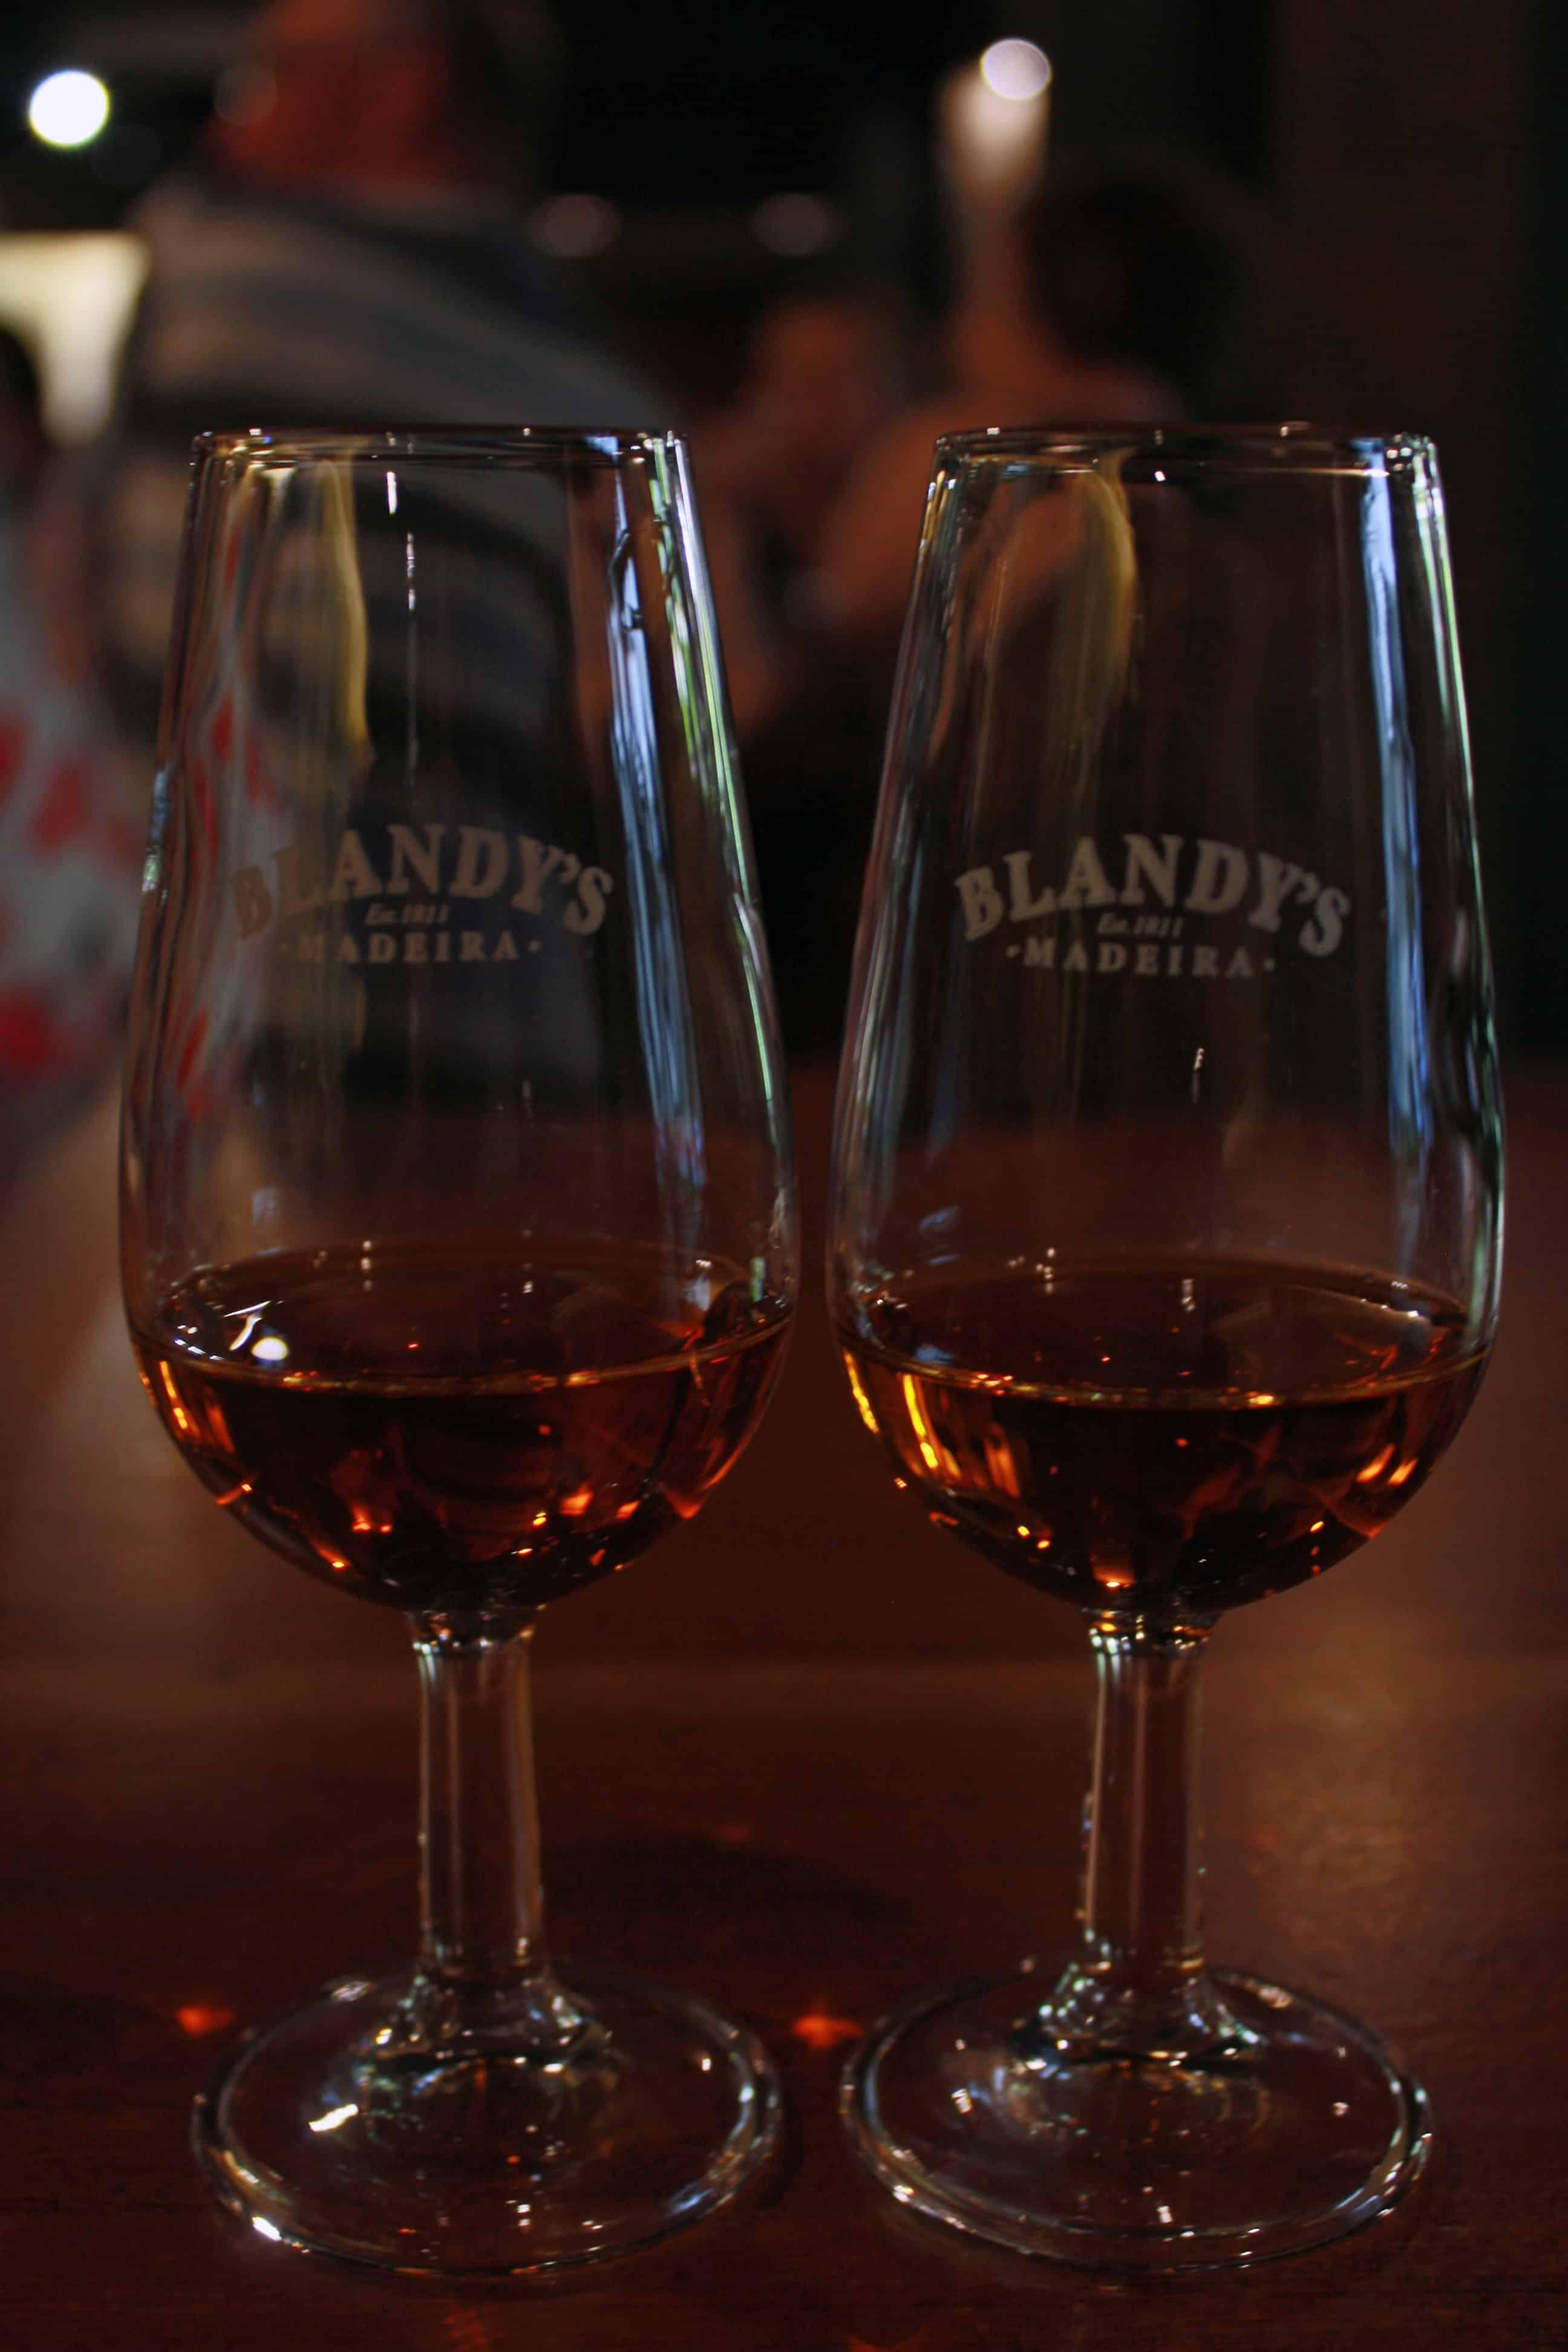 Blandy's Madeira wine samples